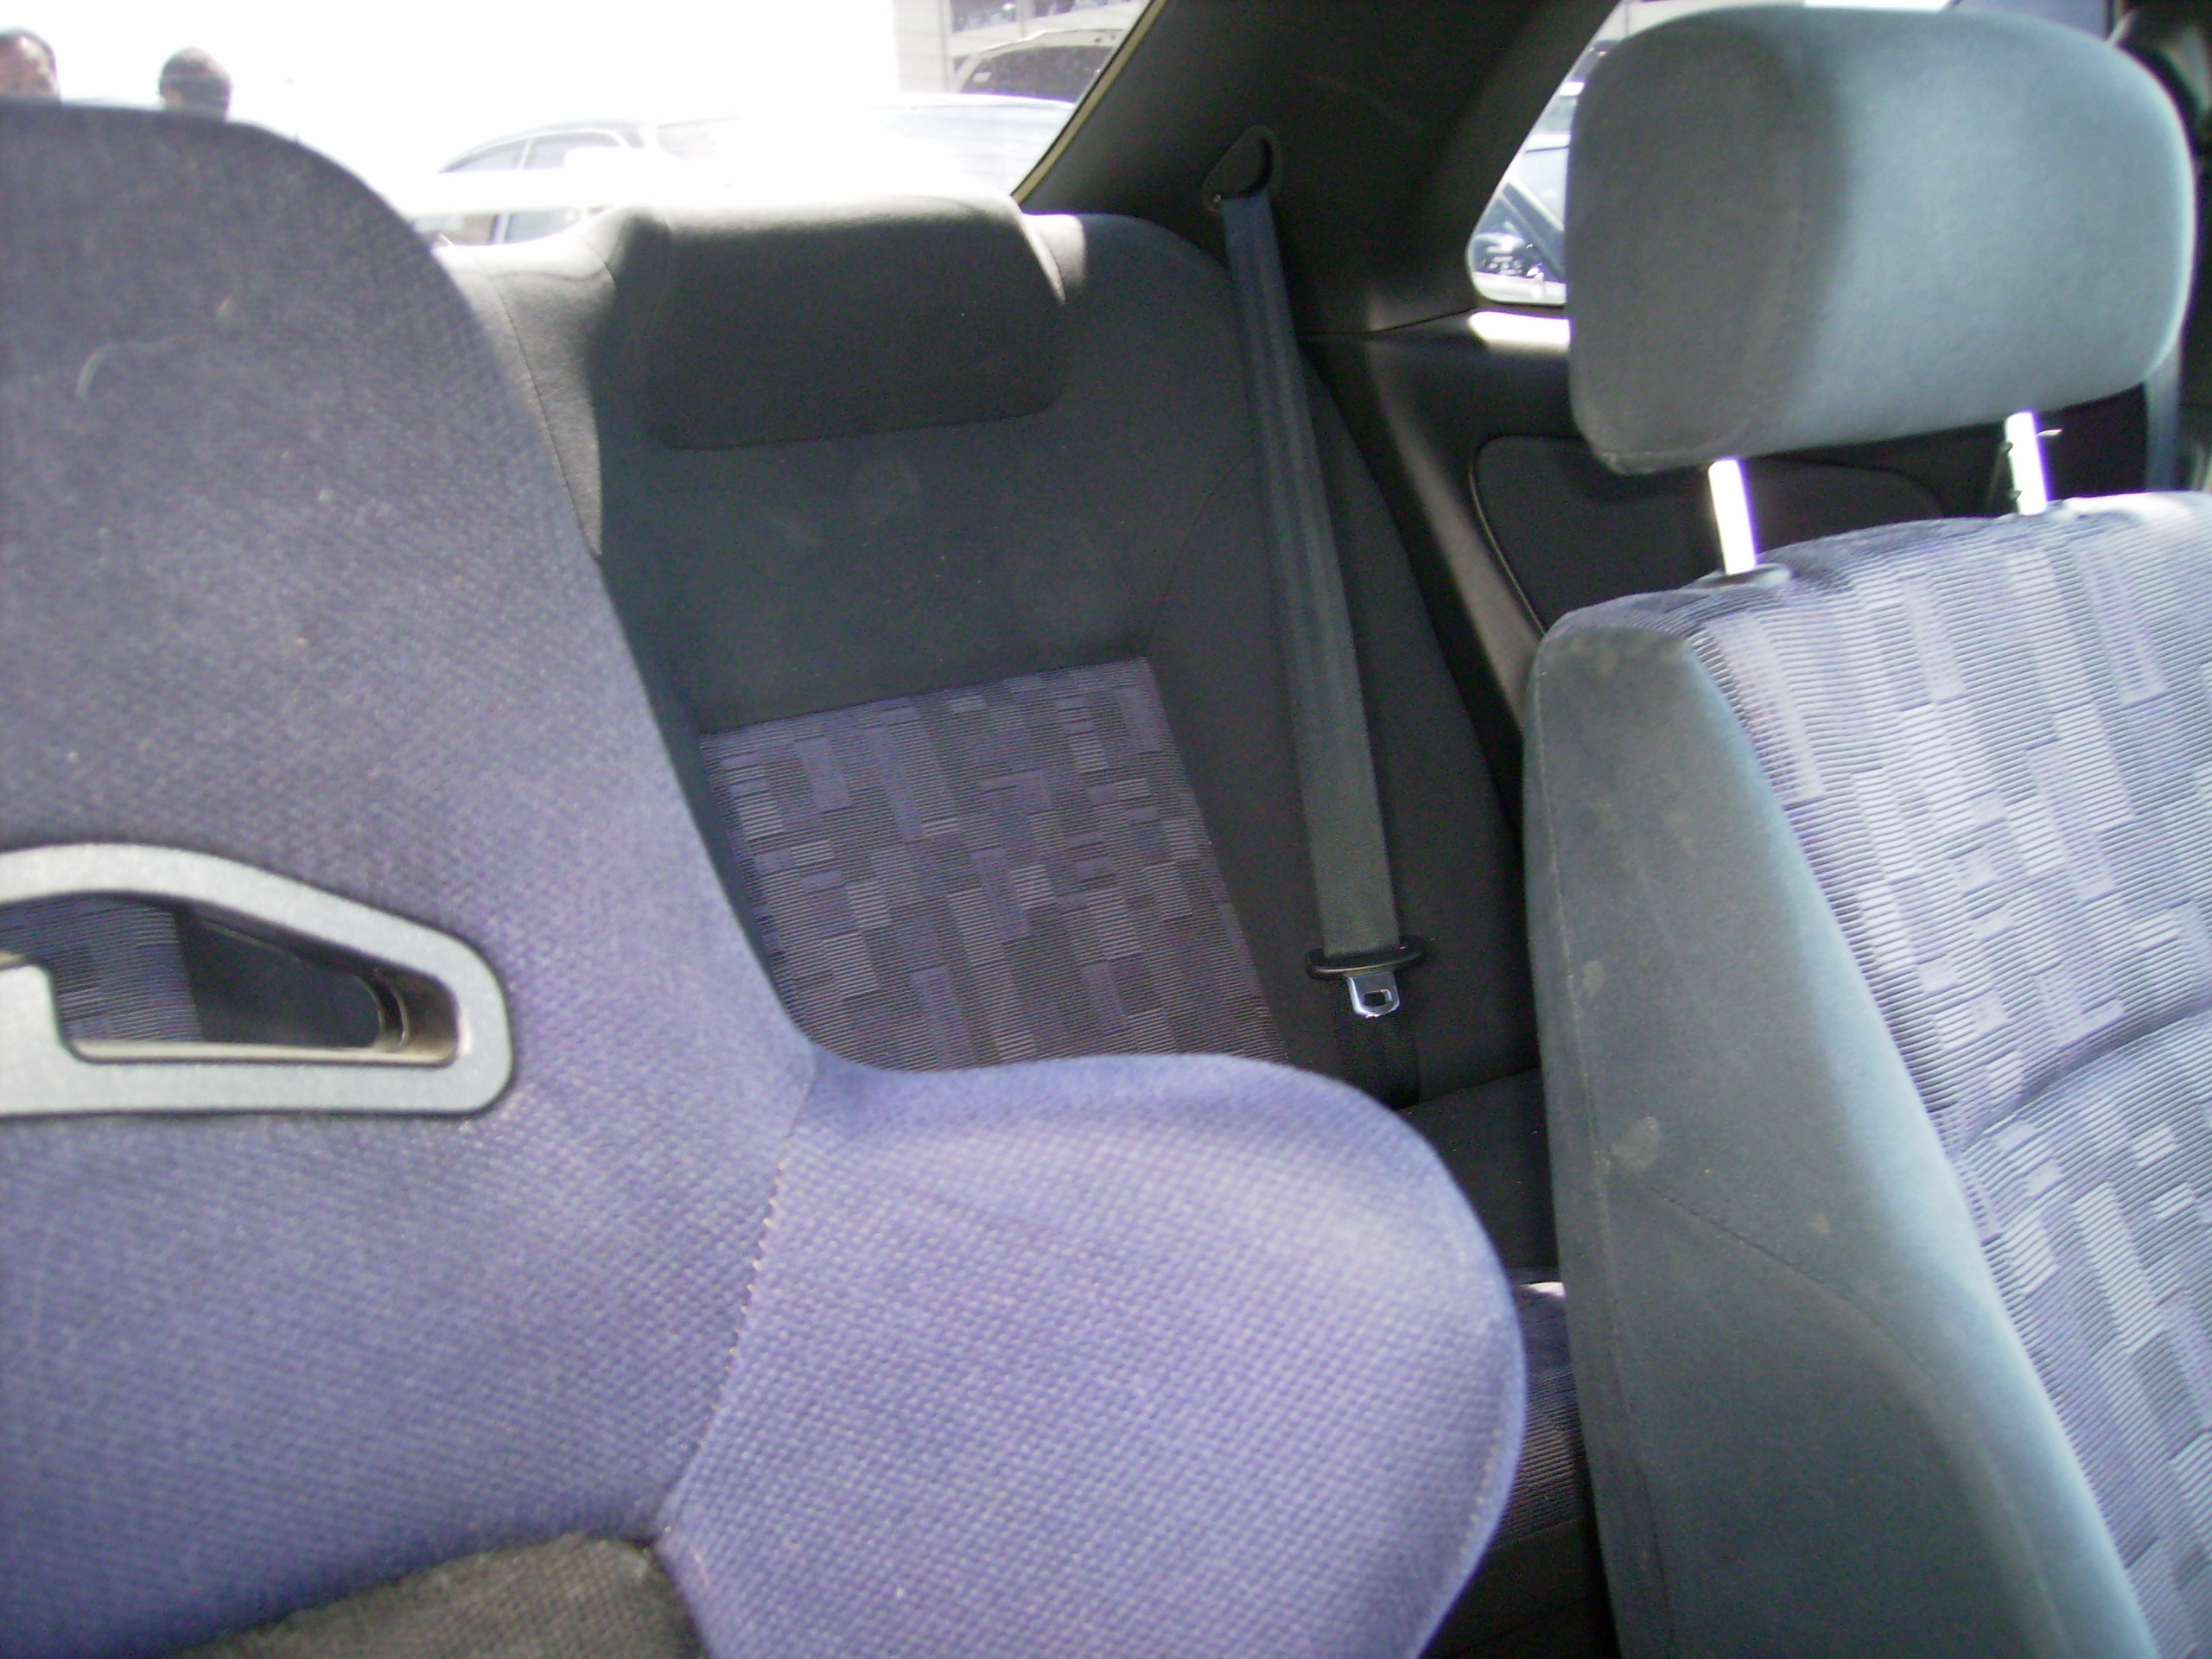 1996 Nissan Skyline R33 Gts-t rear seat